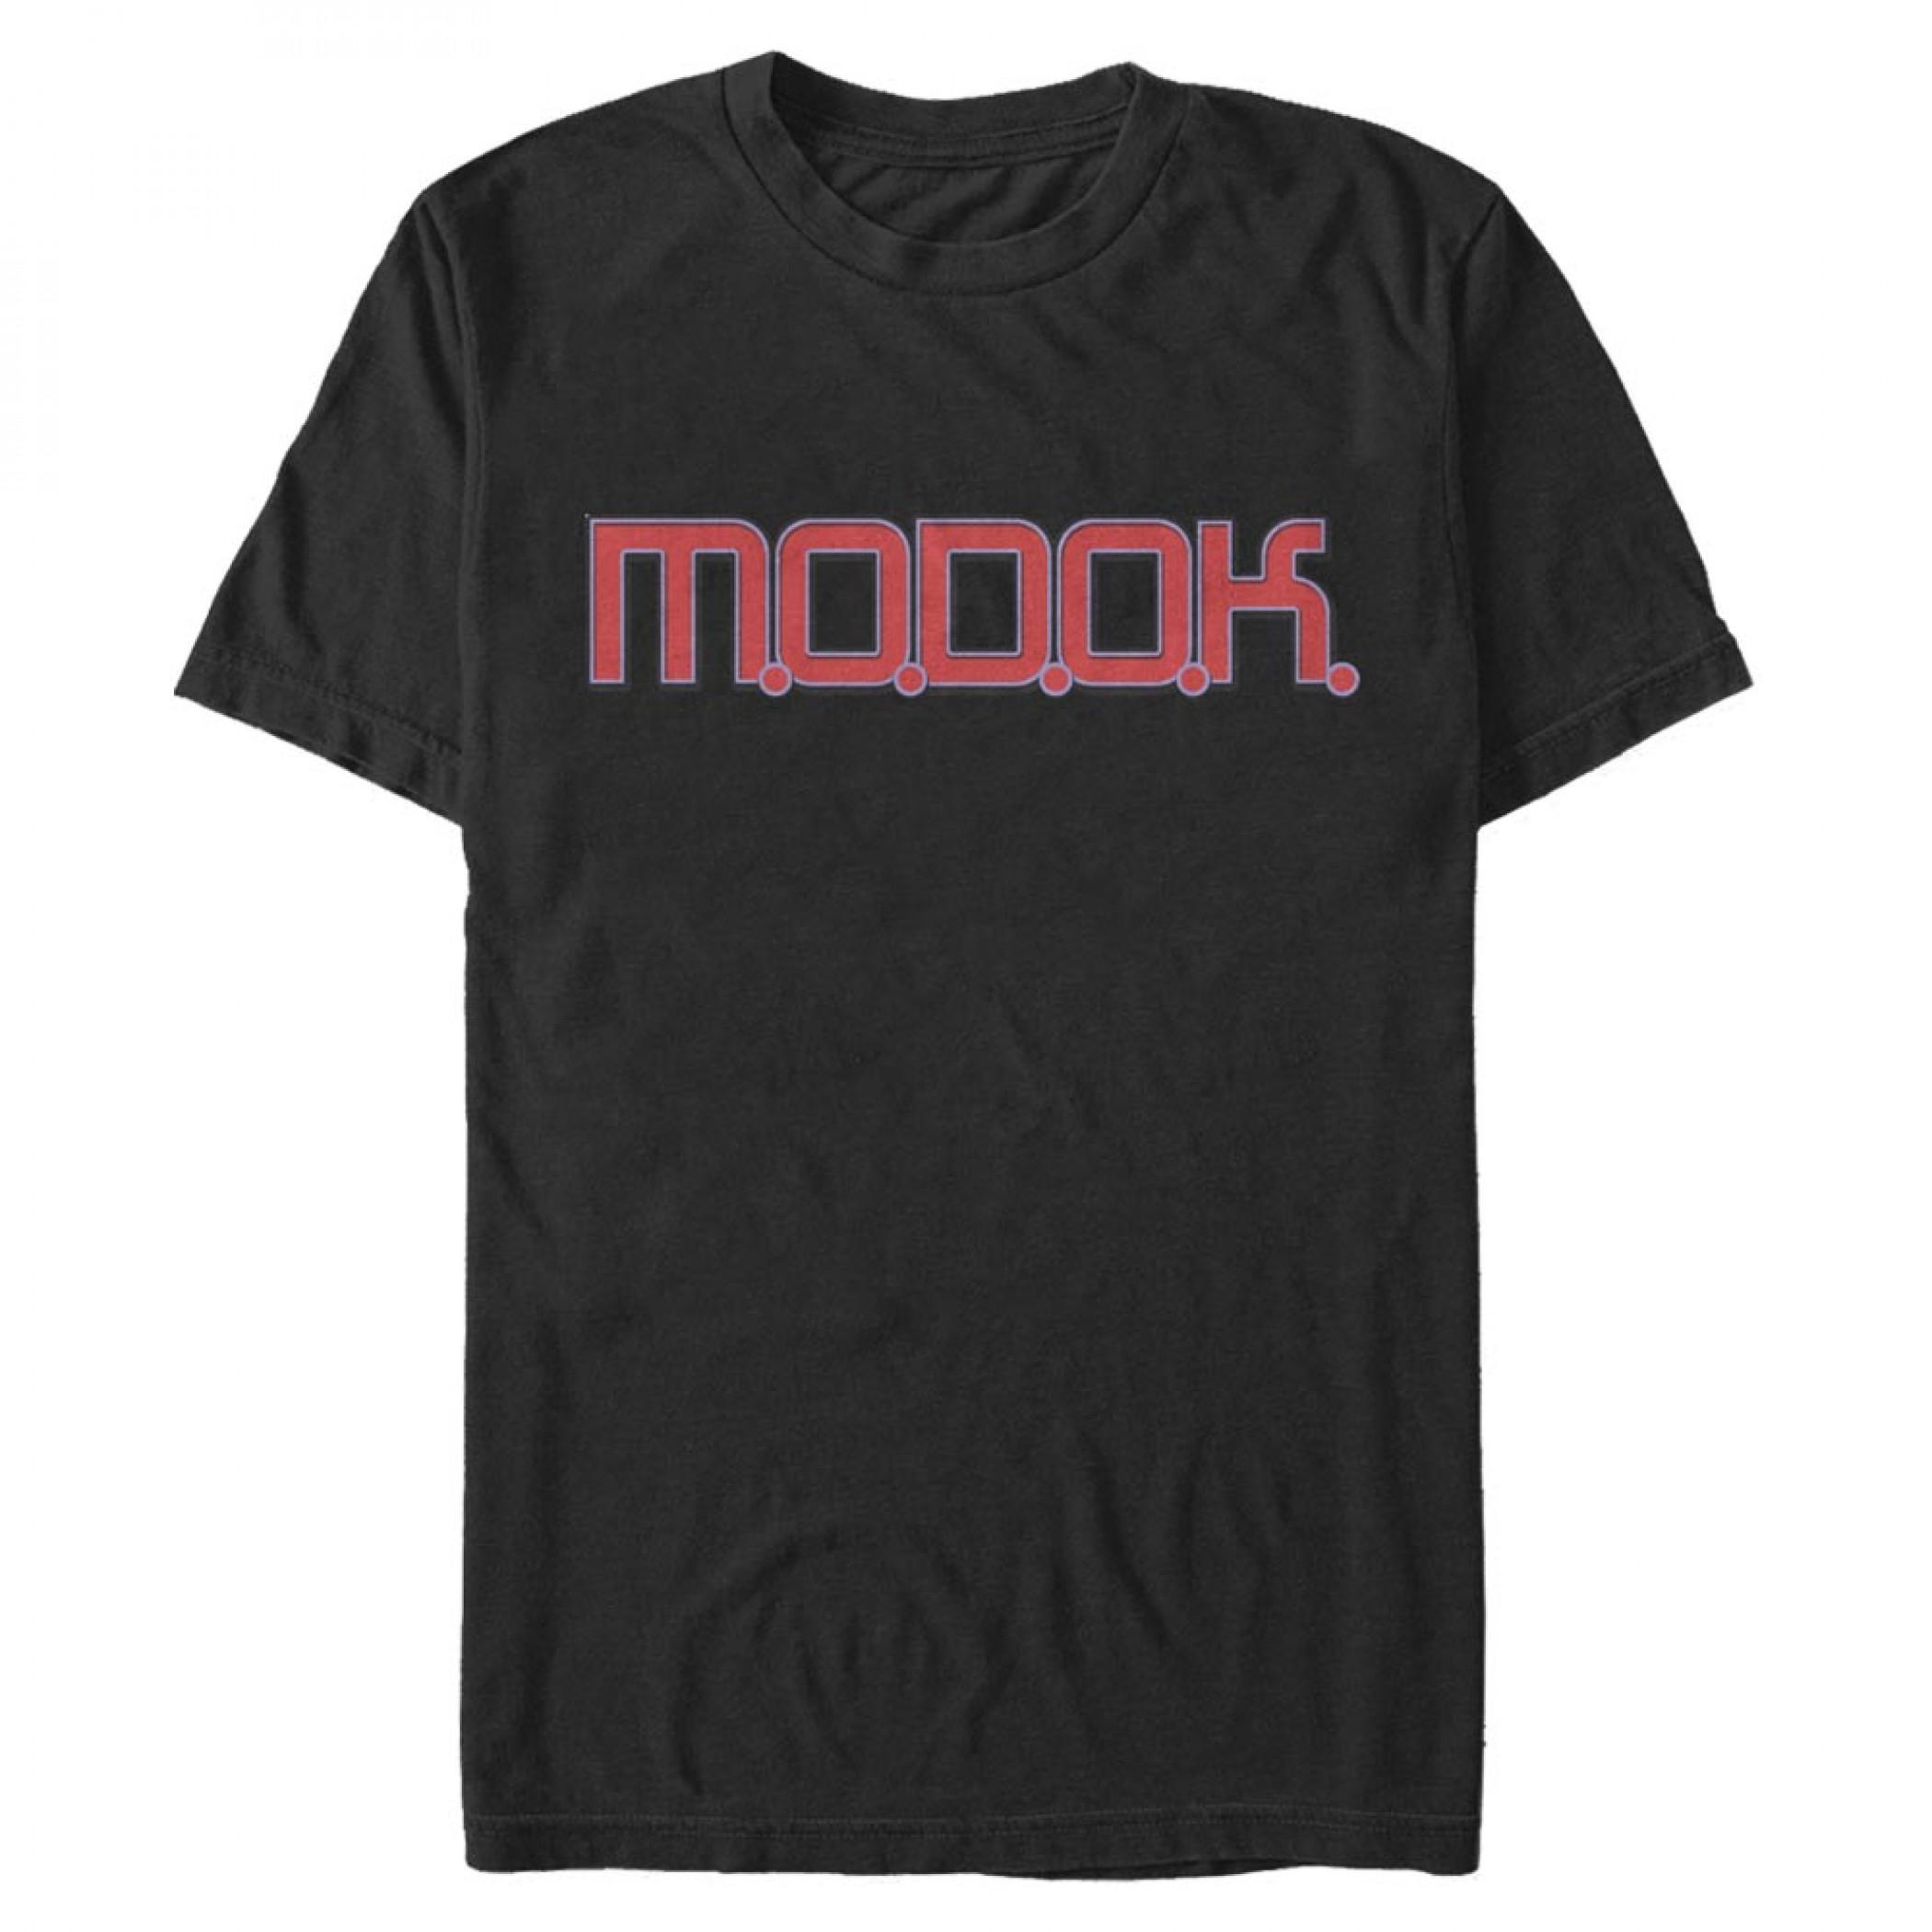 MODOK Text Label T-Shirt